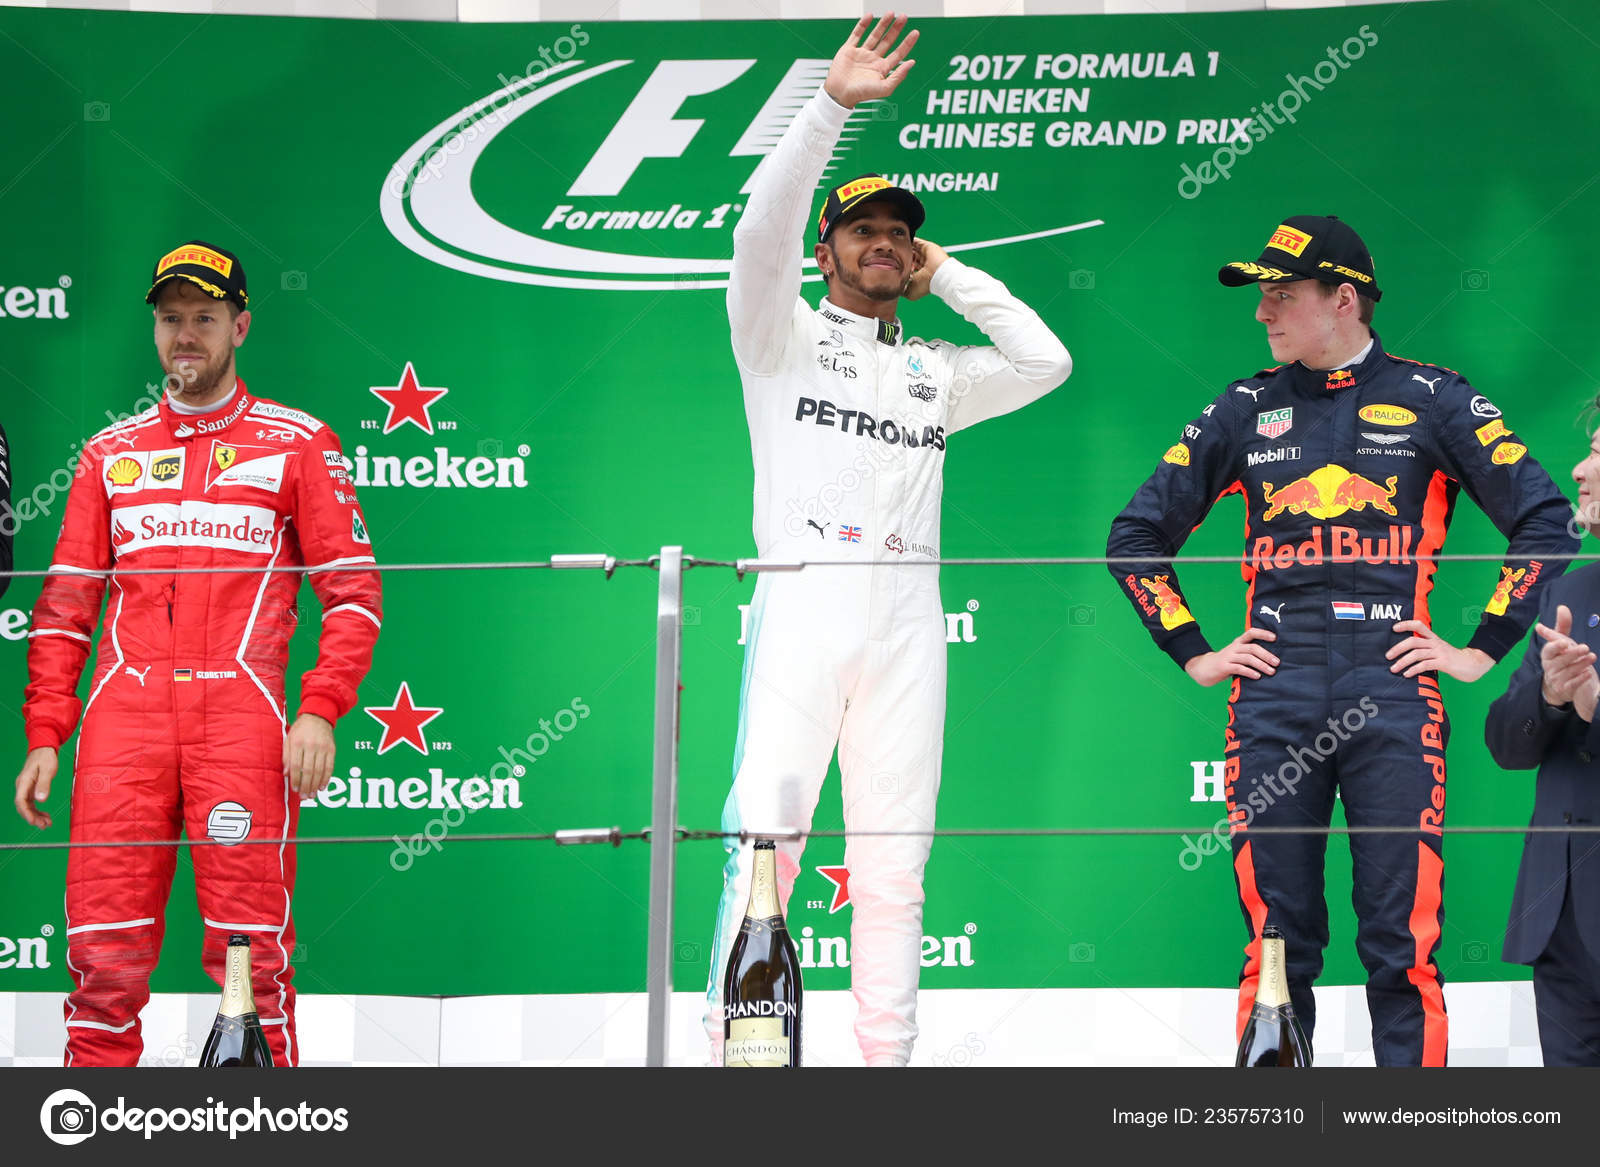 42376f95 British F1 driver Lewis Hamilton of Mercedes AMG, center, waves between German  F1 Sebastian Vettel of Ferrari, left, and Dutch F1 driver Max Verstappen of  ...